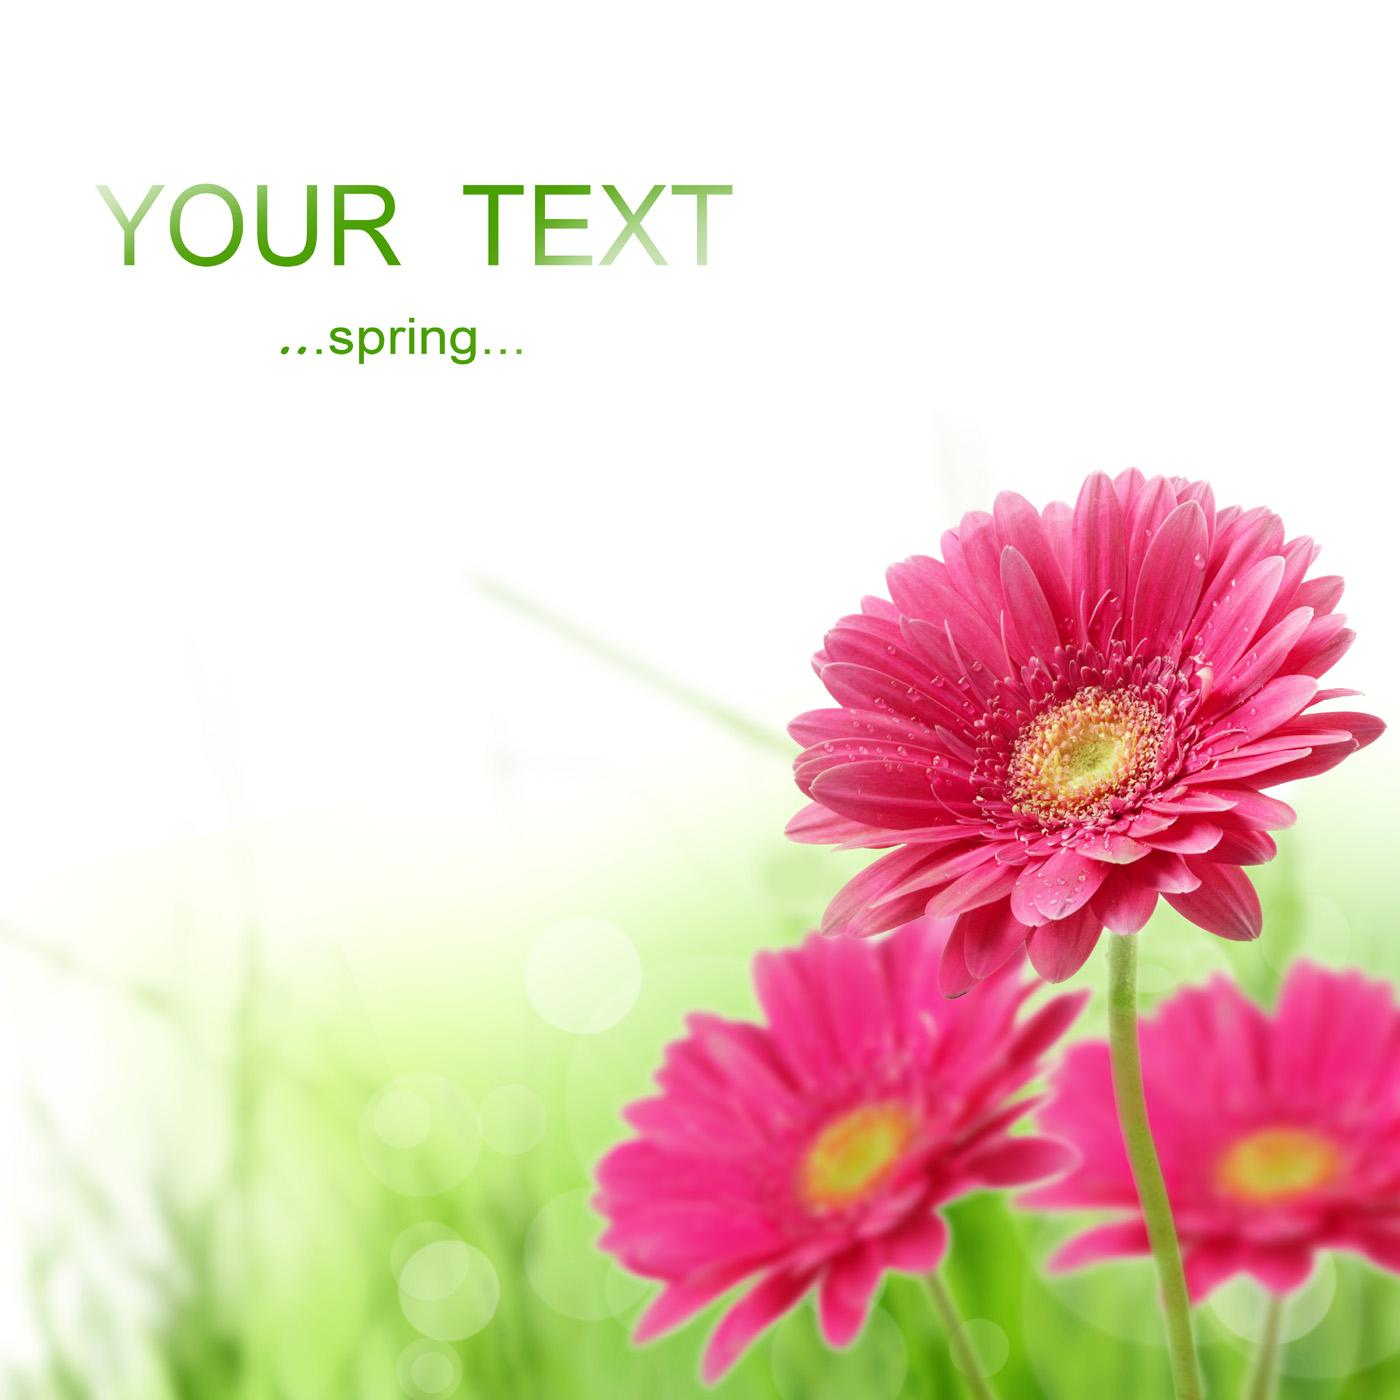 Fresh flowers 27178 - Flower Wallpapers - Flowers